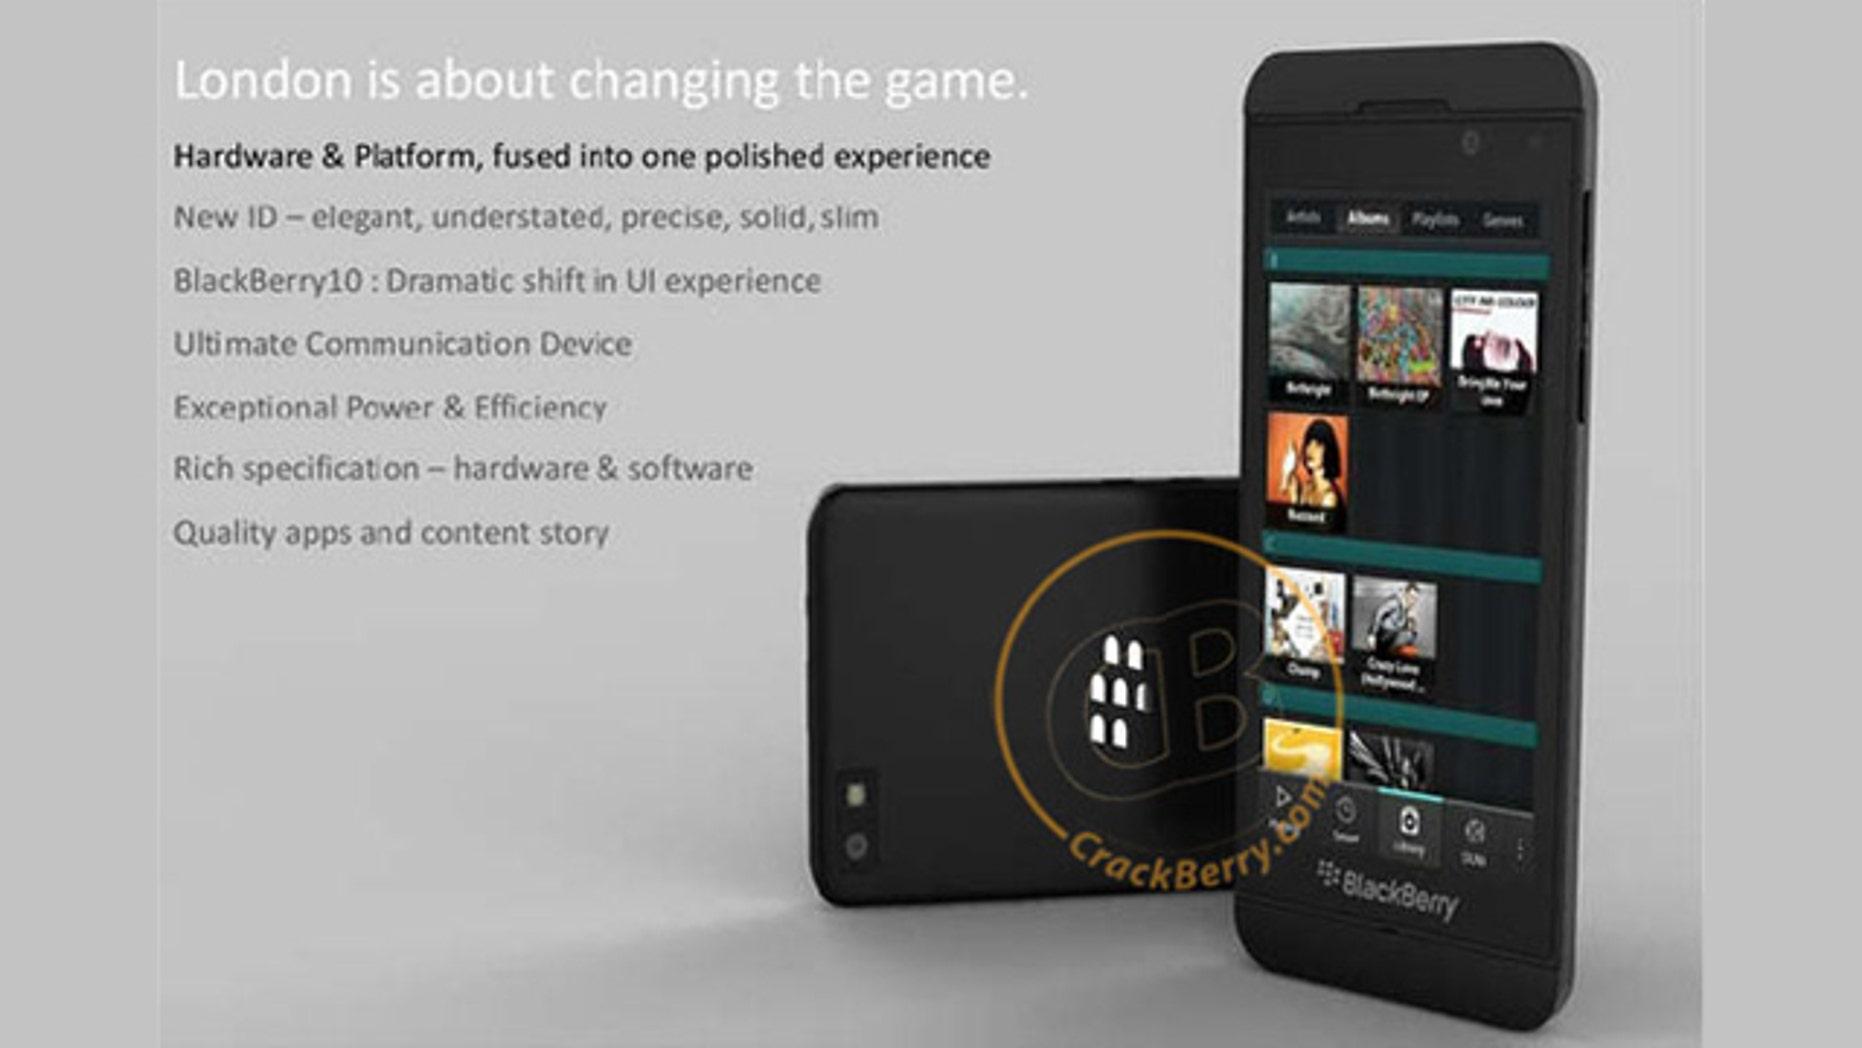 Is this RIM's new BlackBerry phone?